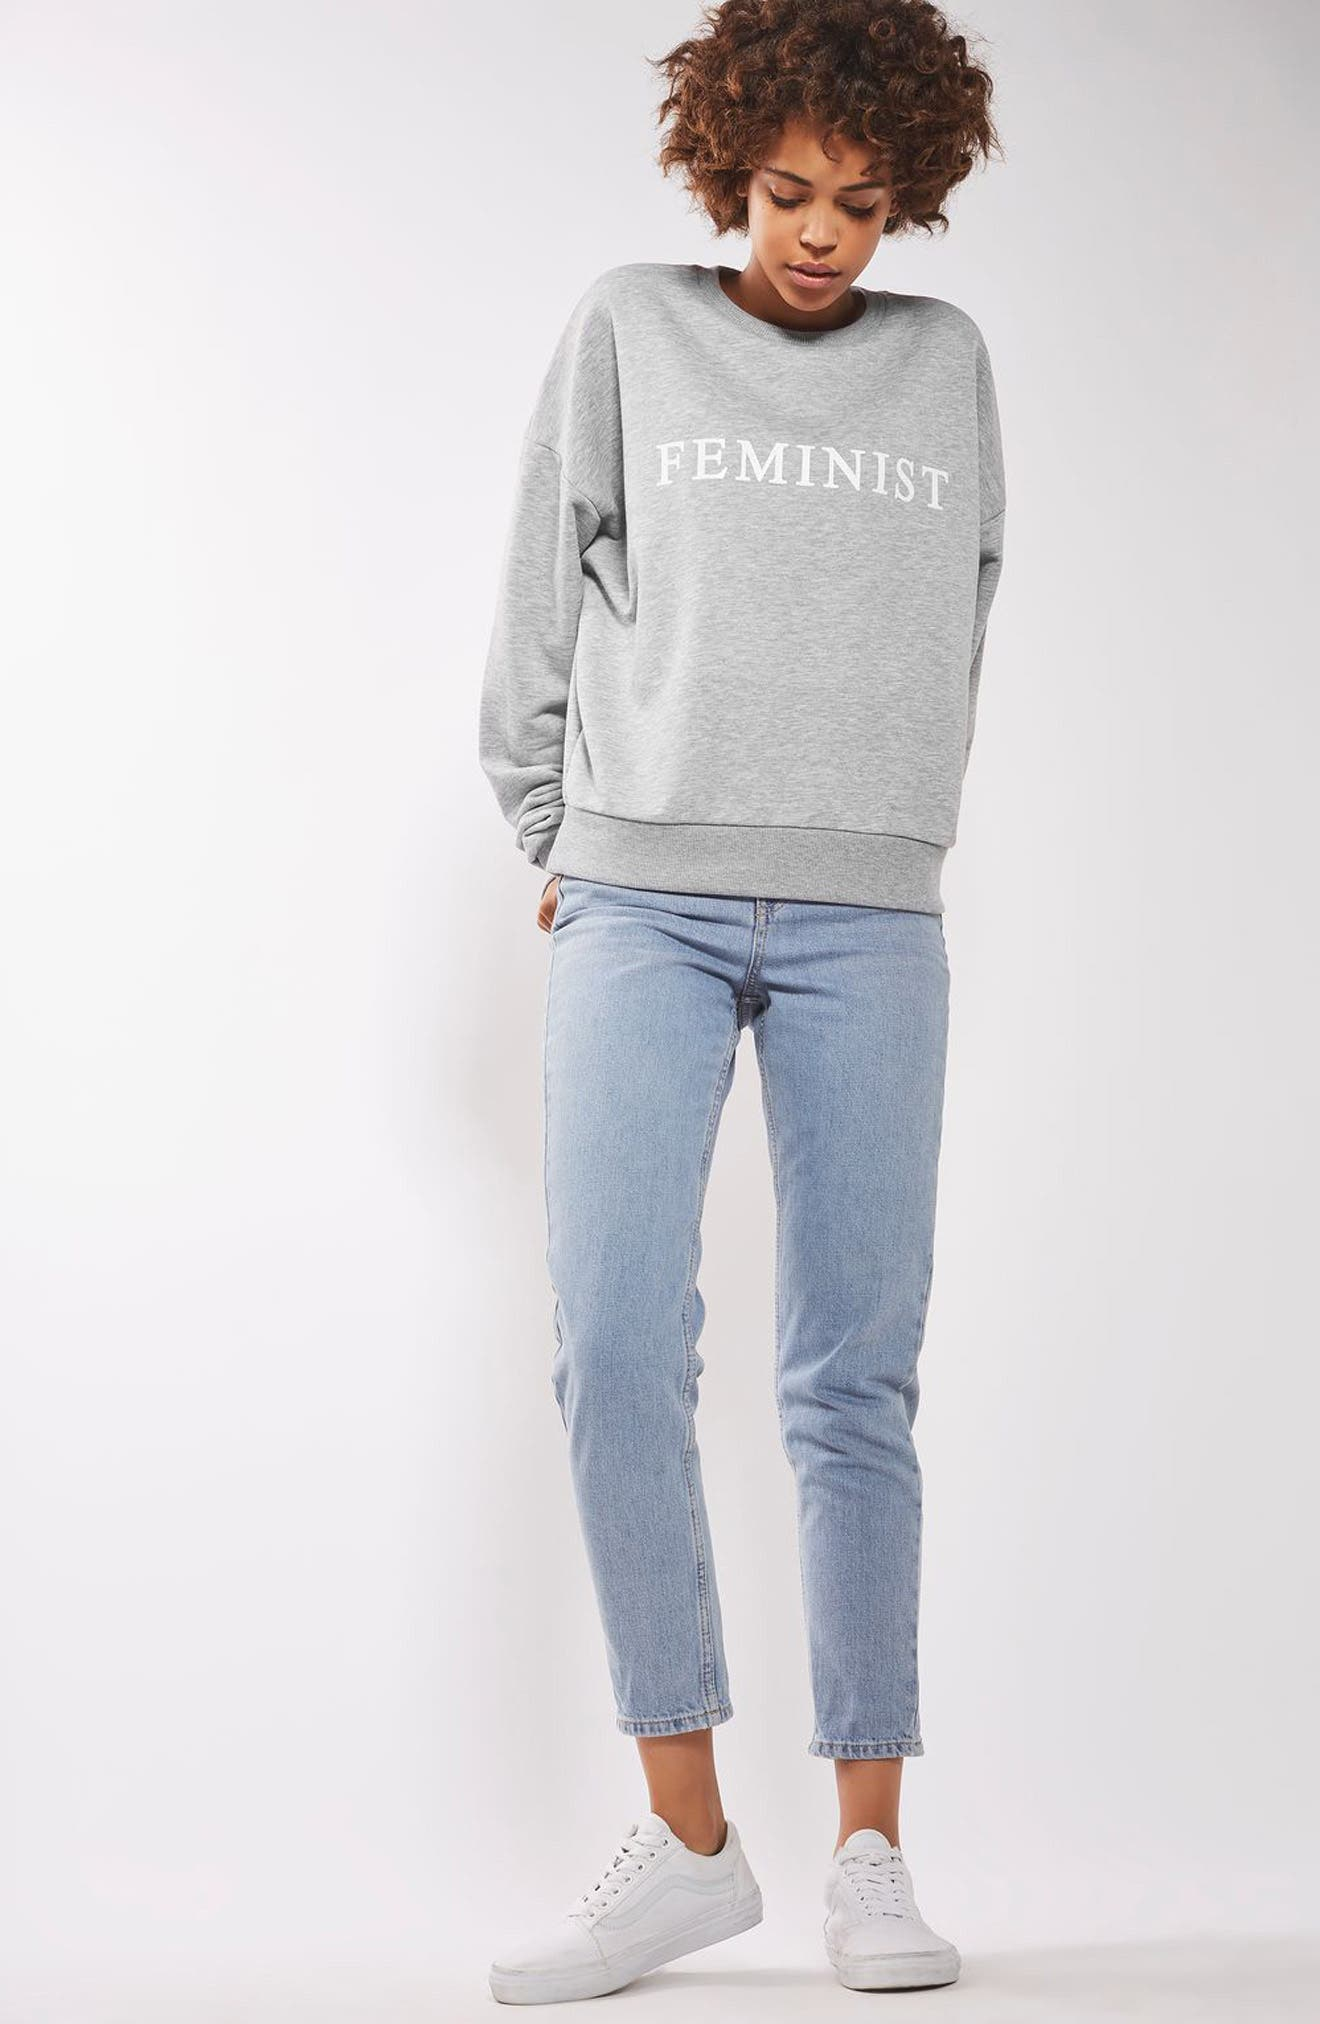 TOPSHOP,                             Feminist Sweatshirt,                             Alternate thumbnail 4, color,                             020